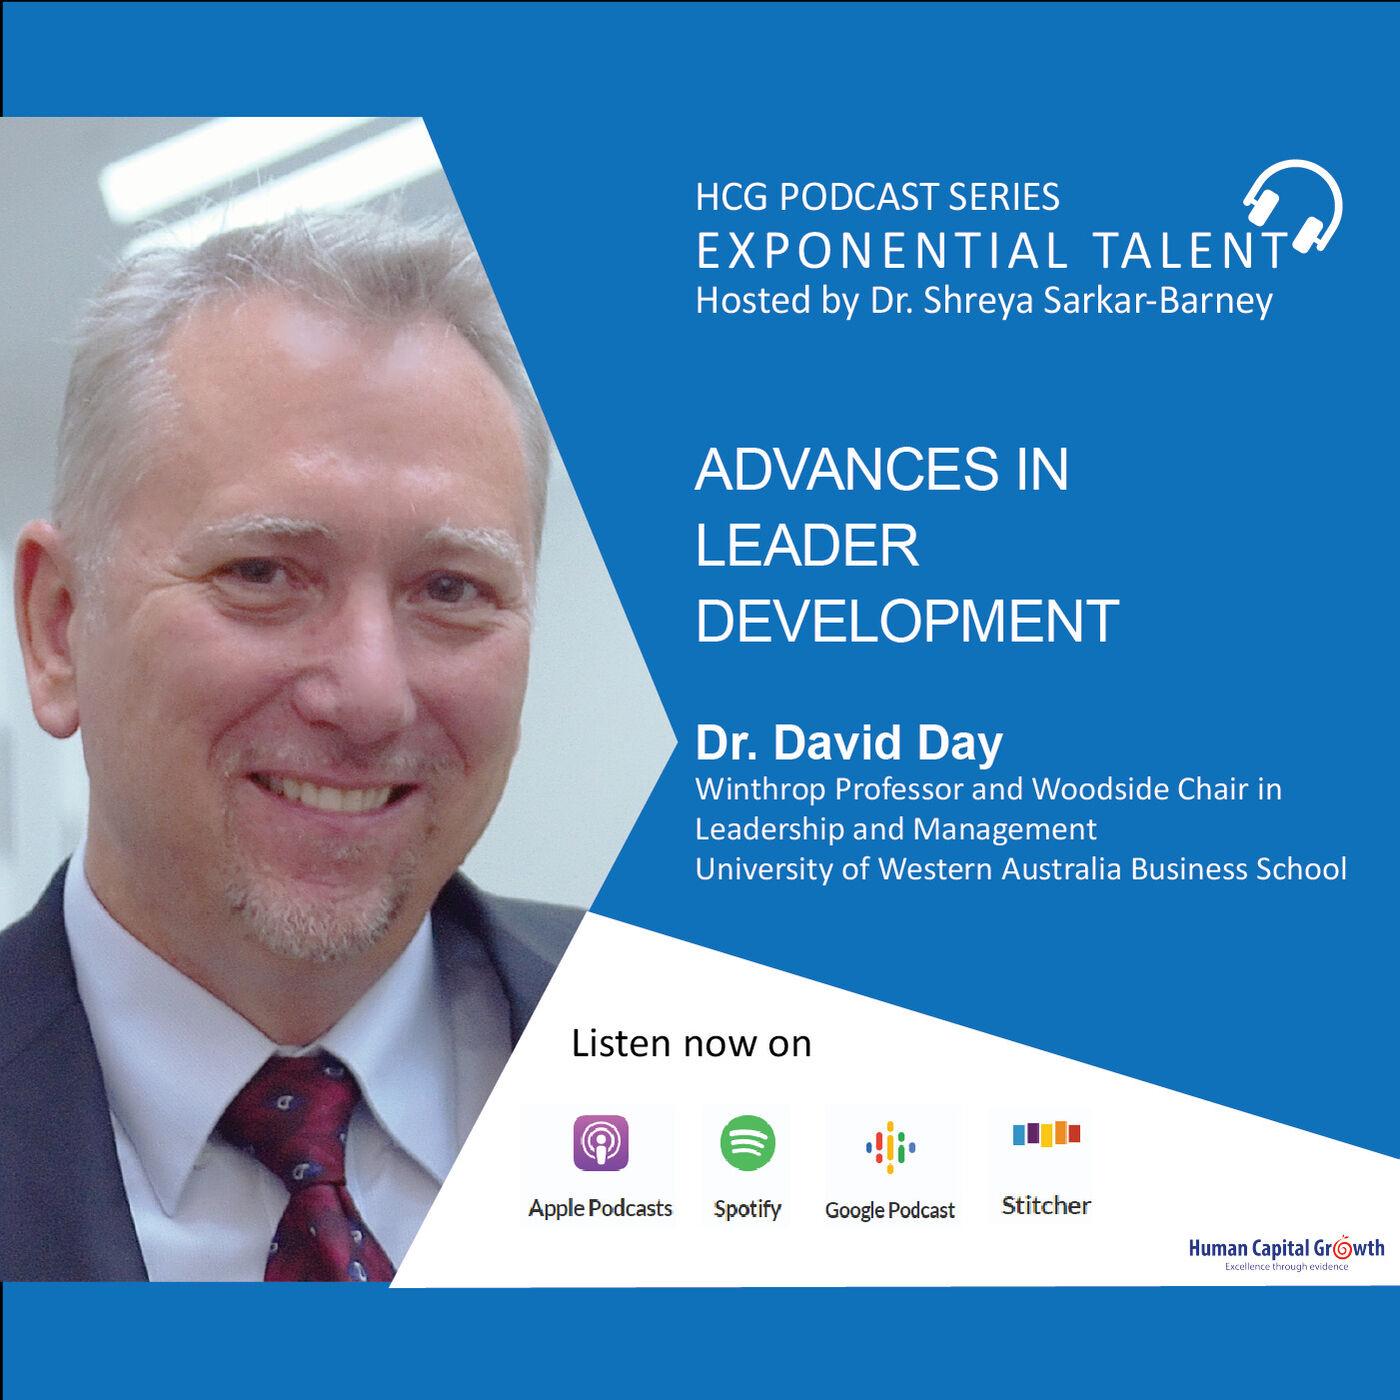 Advances in Leader Development